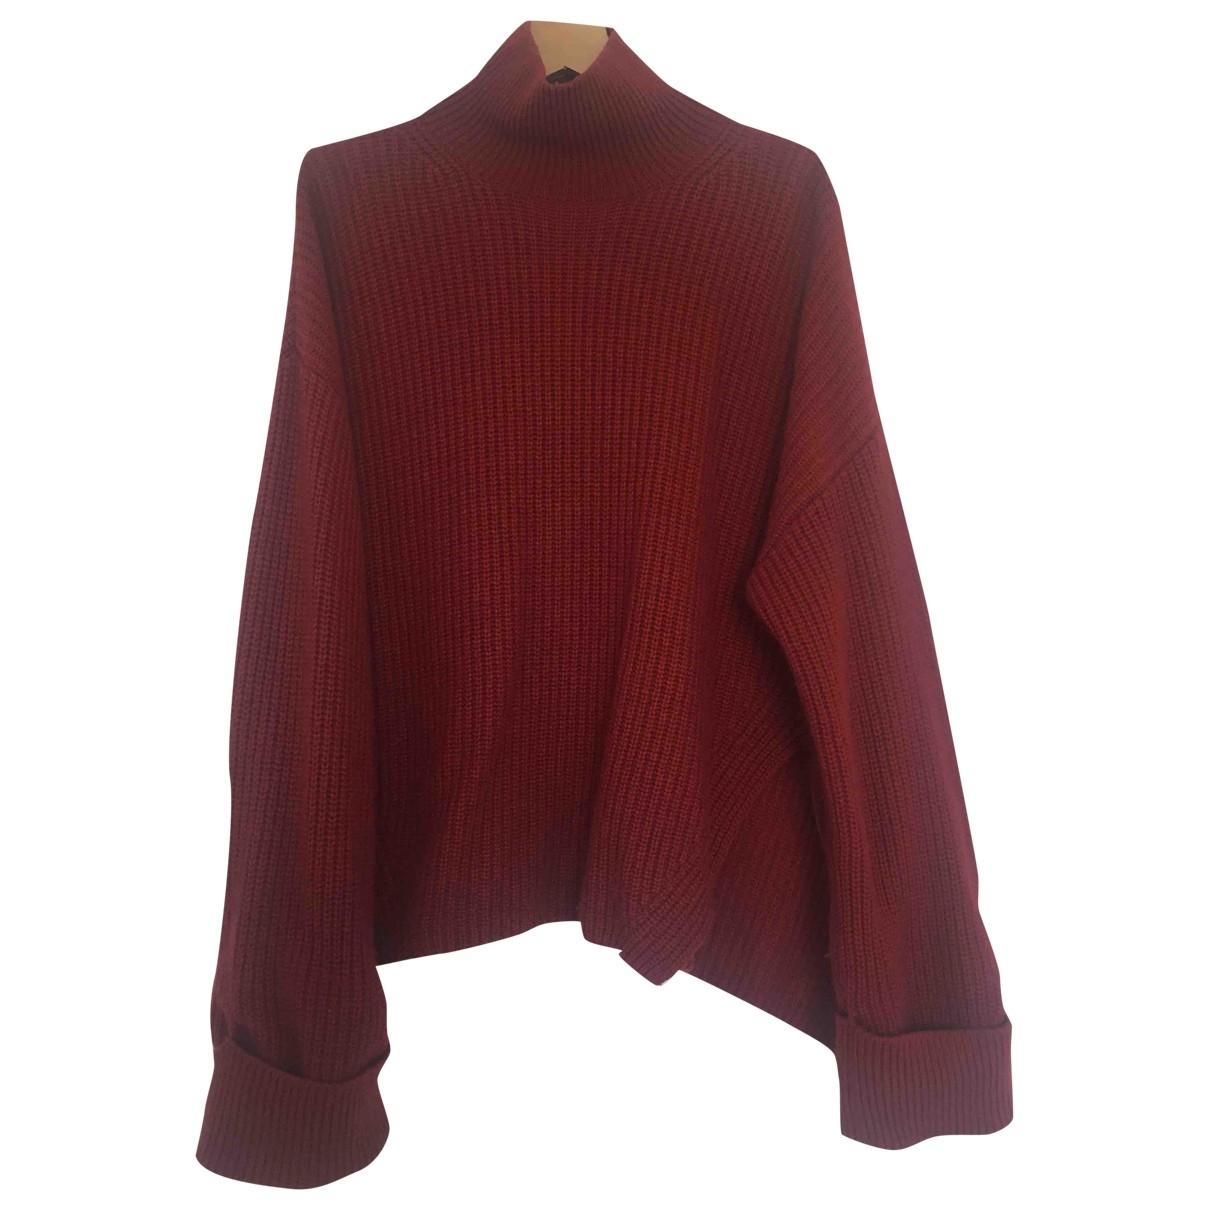 & Stories \N Burgundy Wool Knitwear for Women 38 FR